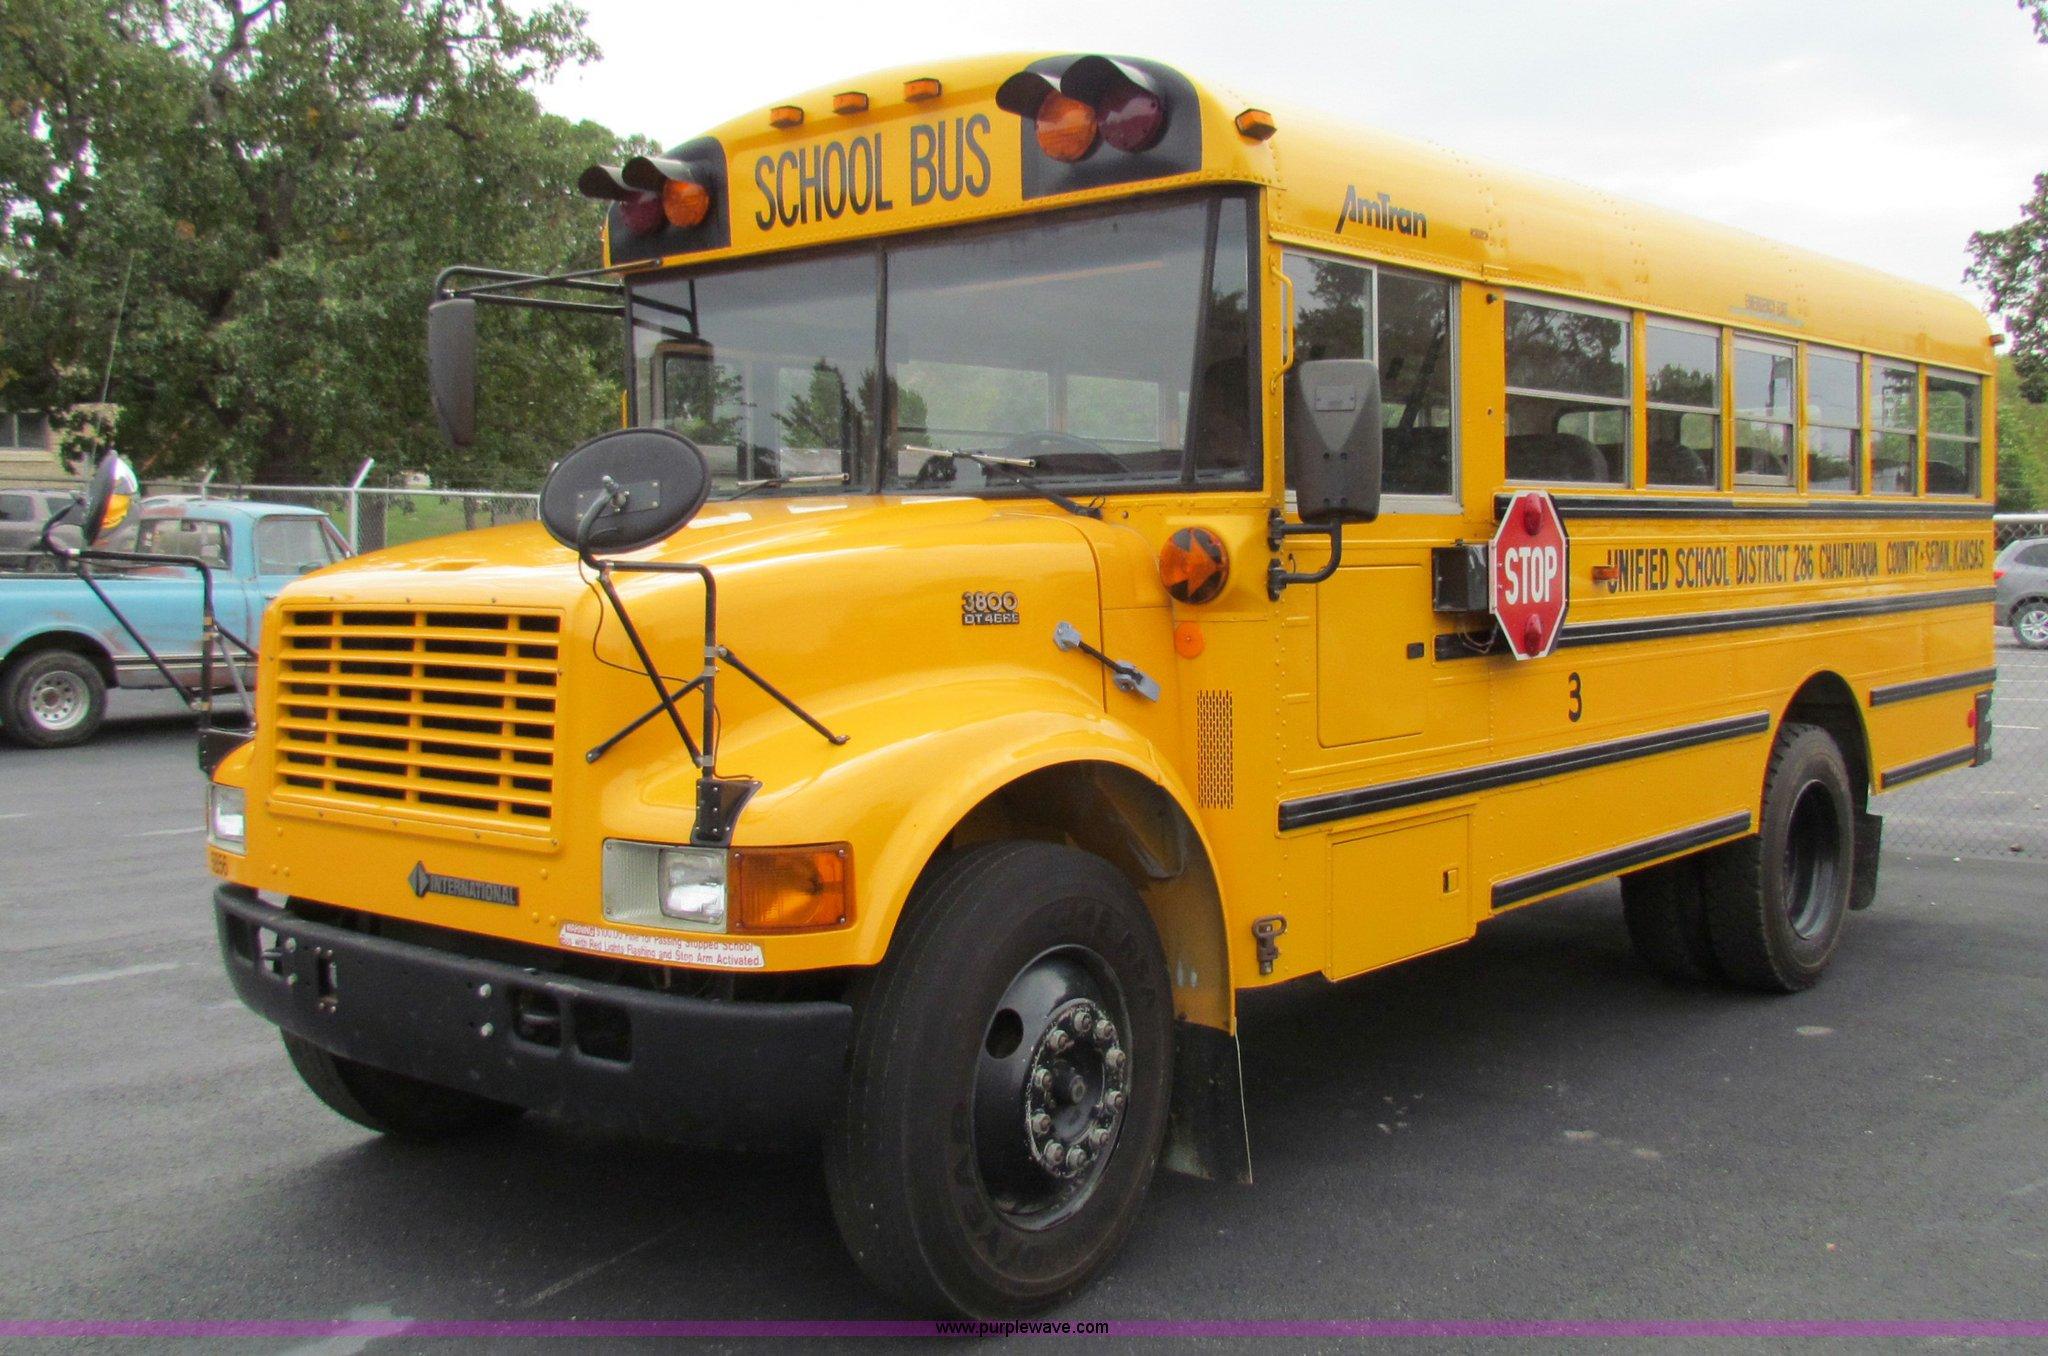 1997 International 3800 school bus | Item E8091 | SOLD! Tues